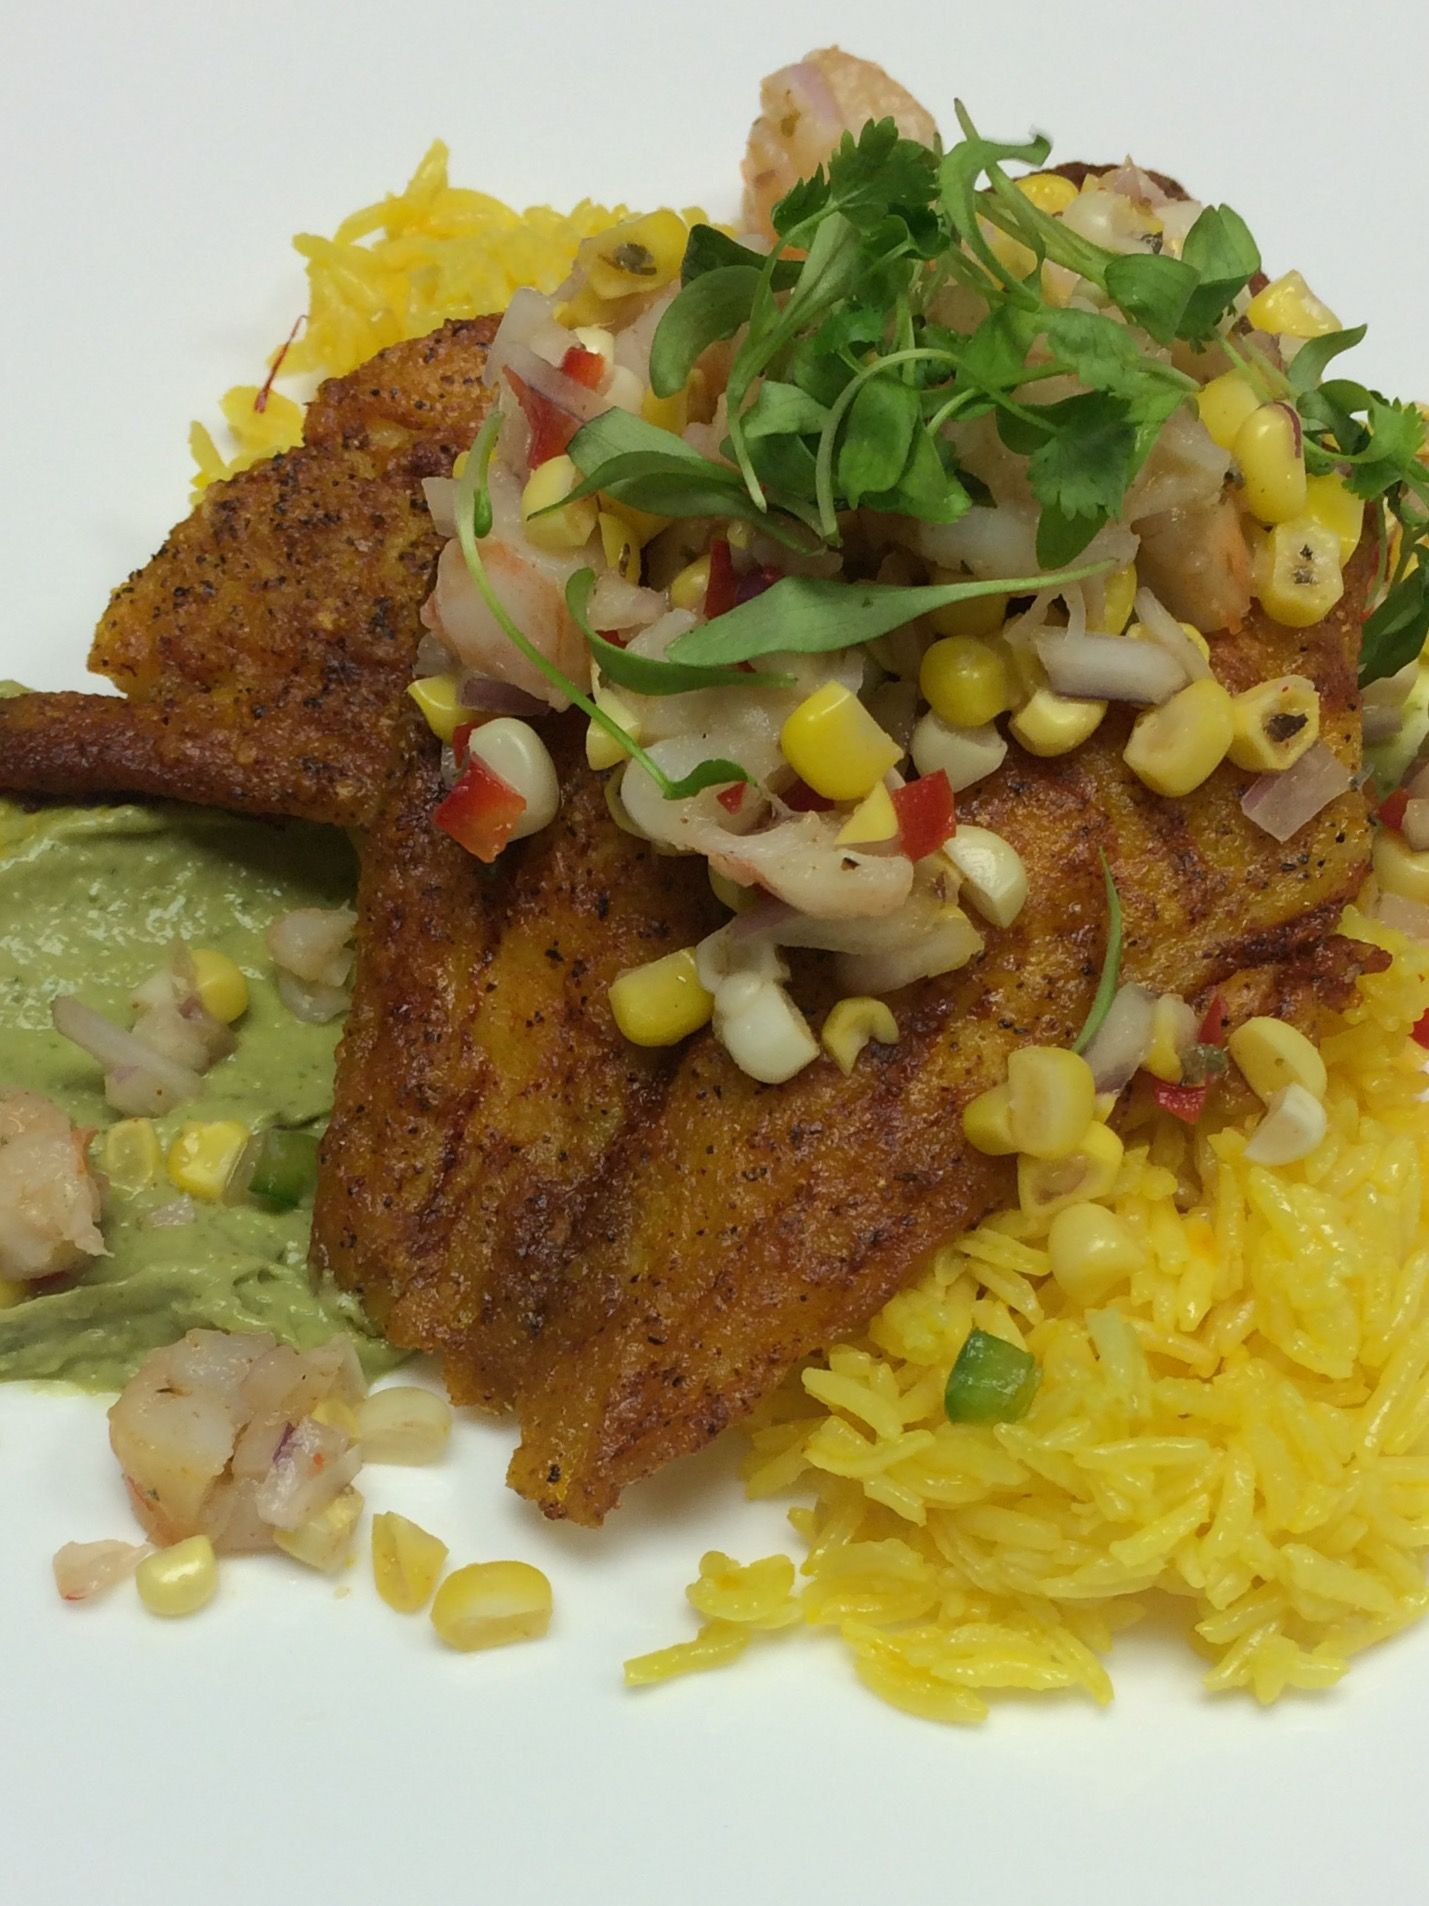 Achiote roasted snapper, saffron basmati rice, avocado aioli, smoked shrimp & sweet corn salsa